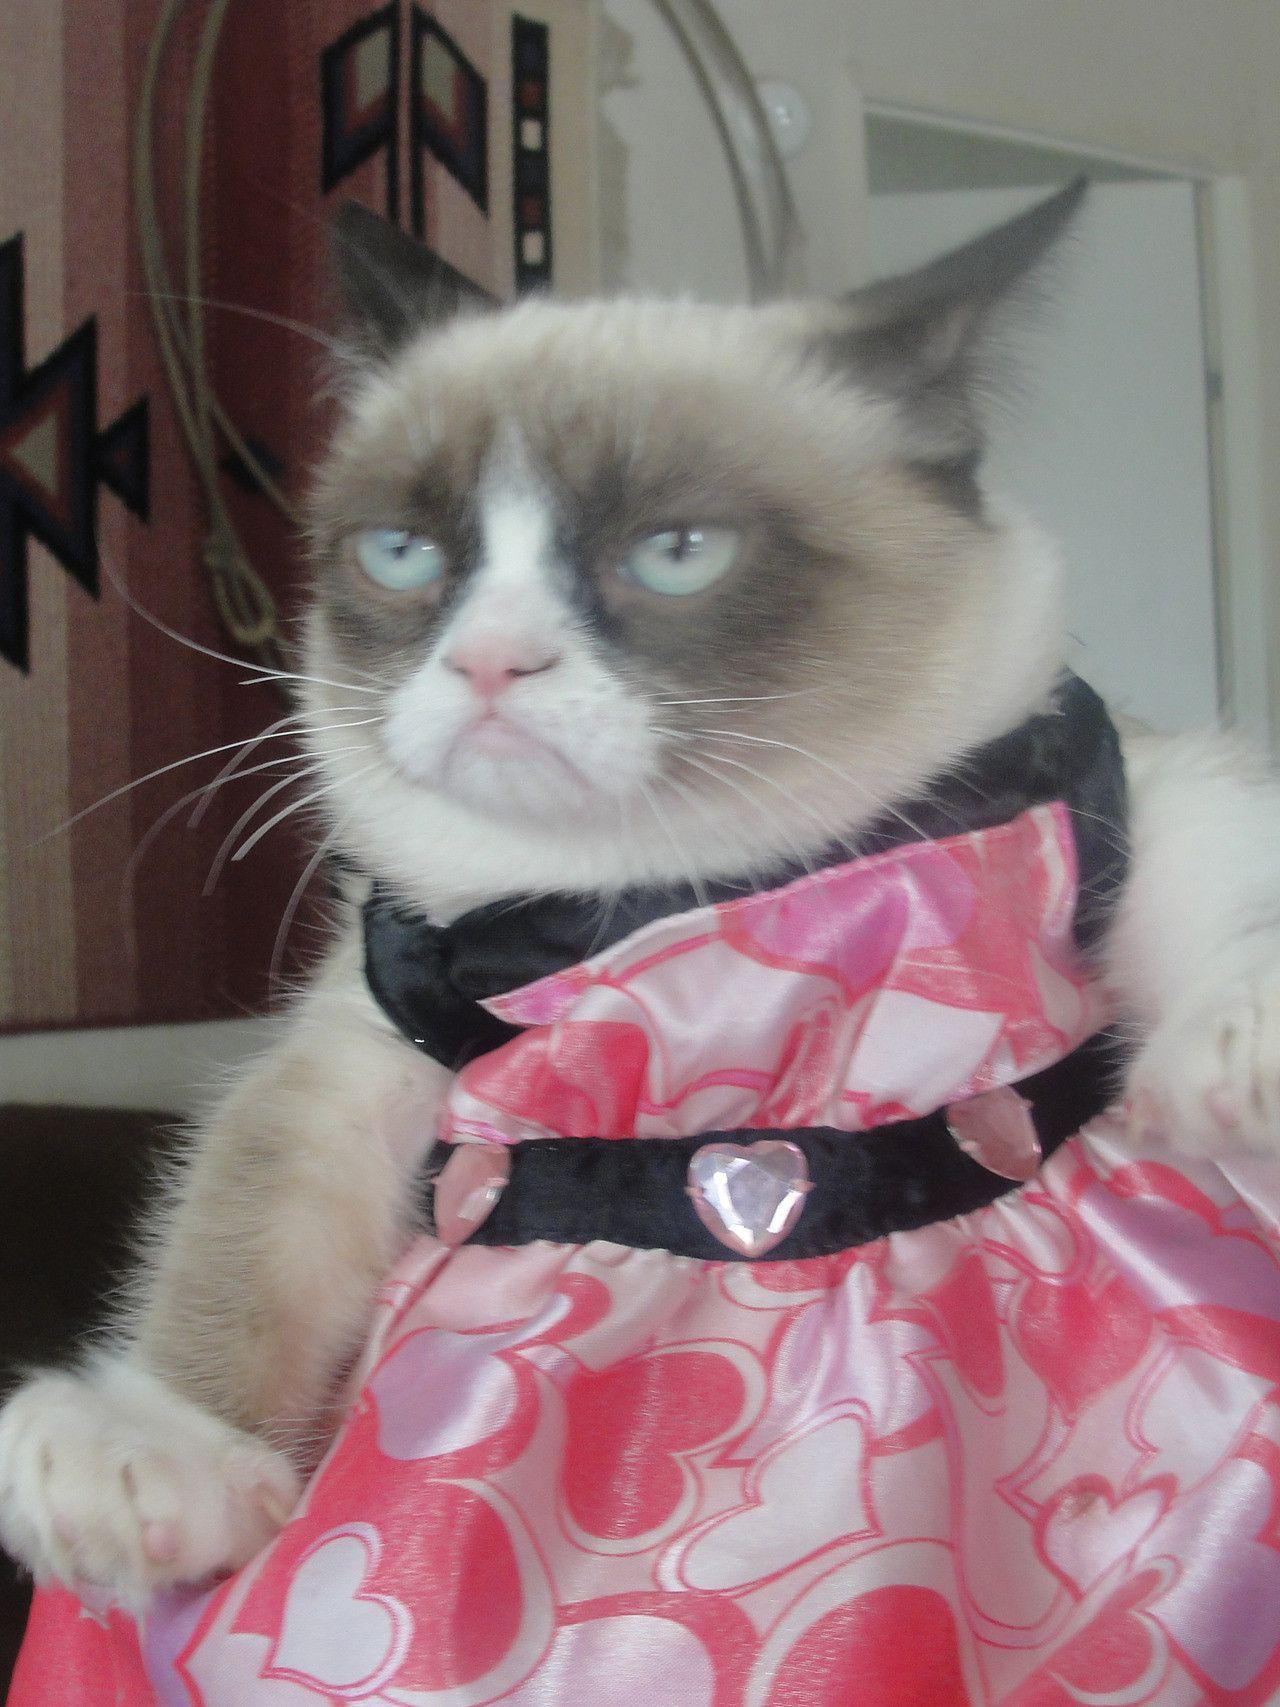 (UN)HAPPY HALLOWEEN FROM GRUMPY CAT Funny grumpy cat